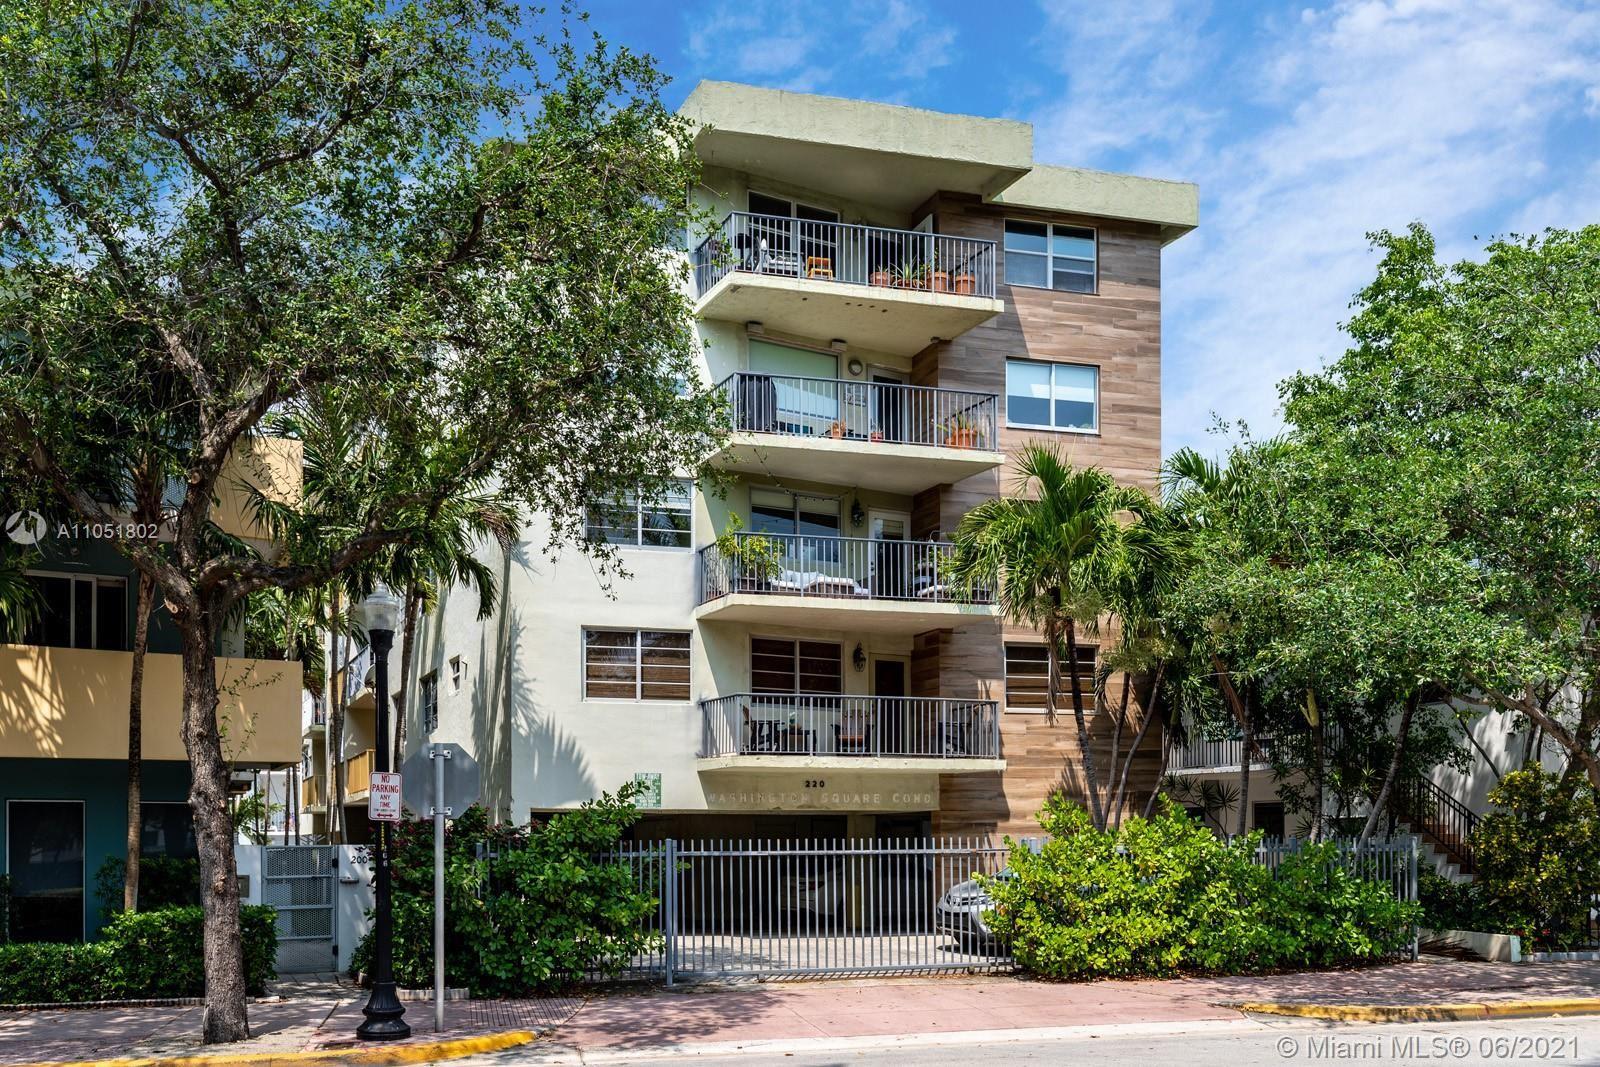 220 Washington Ave #5C, Miami Beach, FL 33139 - #: A11051802